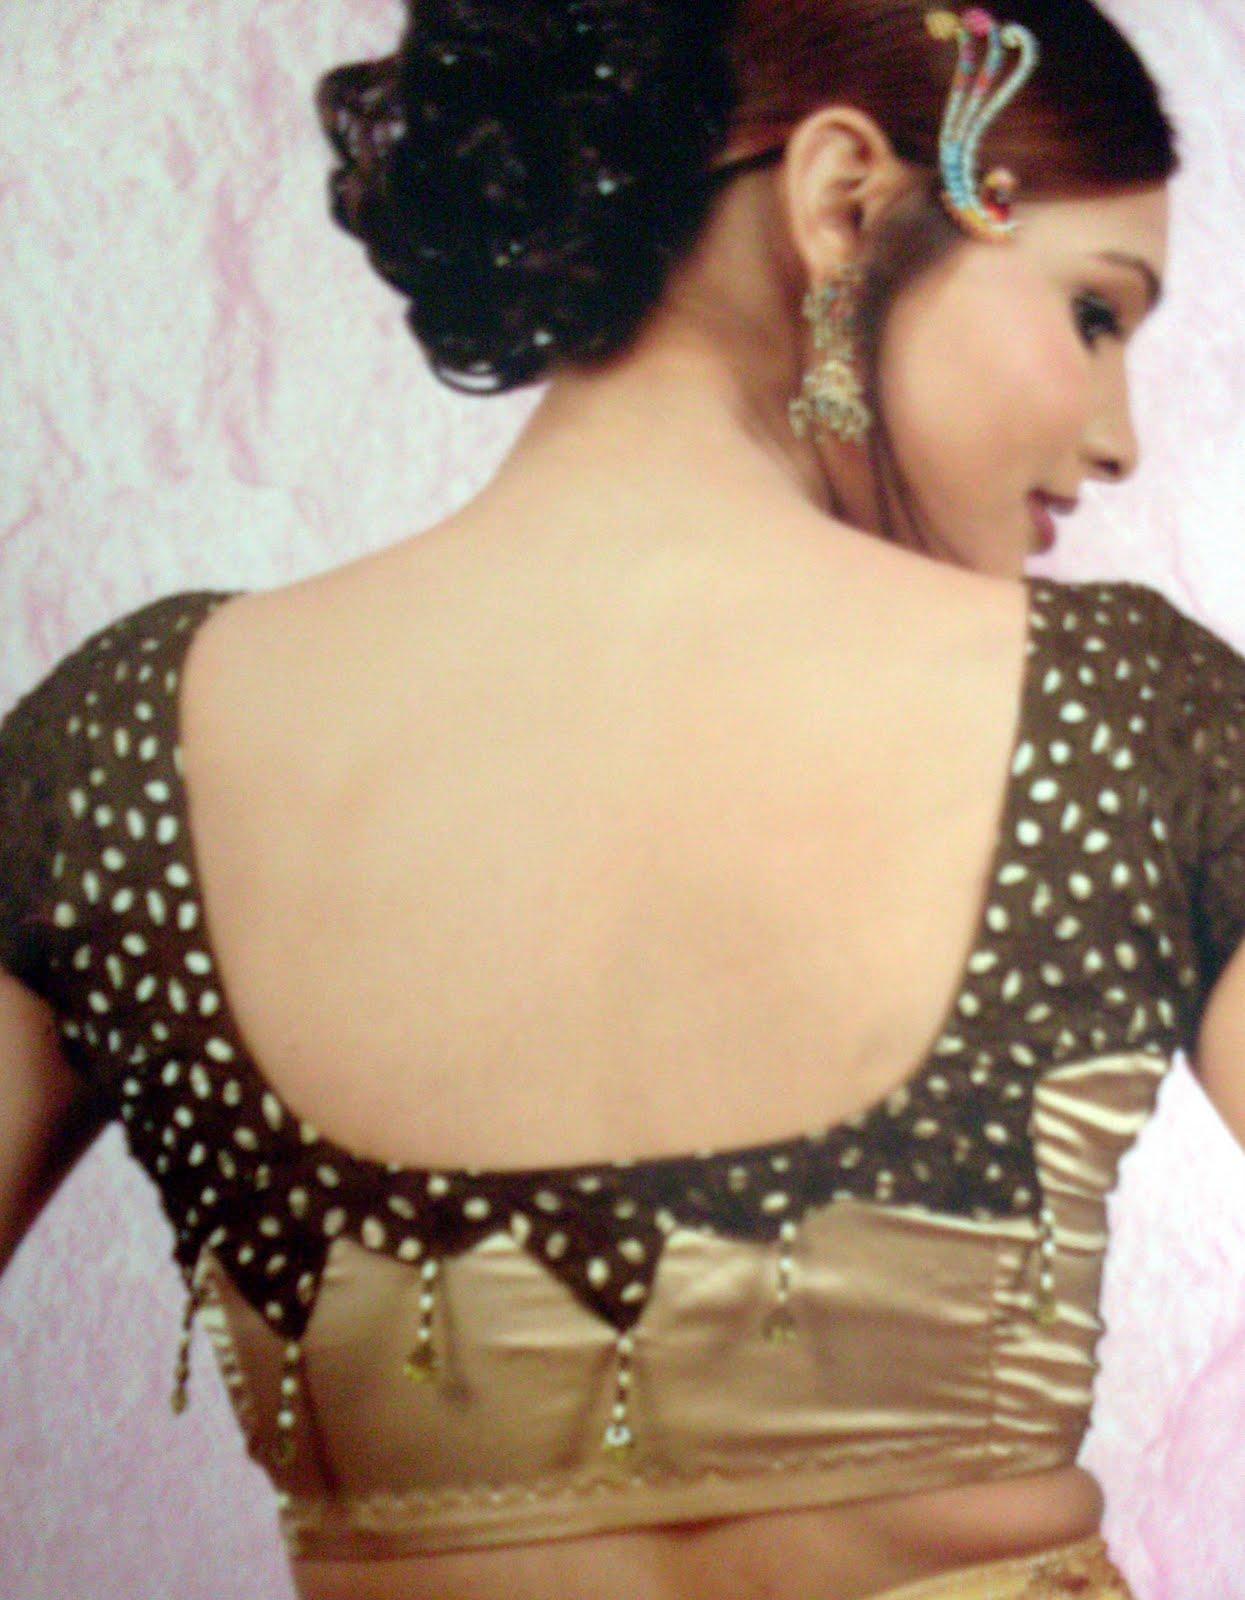 Original Design Women Blouse Lehenga Blouse DesignsCasual Blouse For Fat Woman